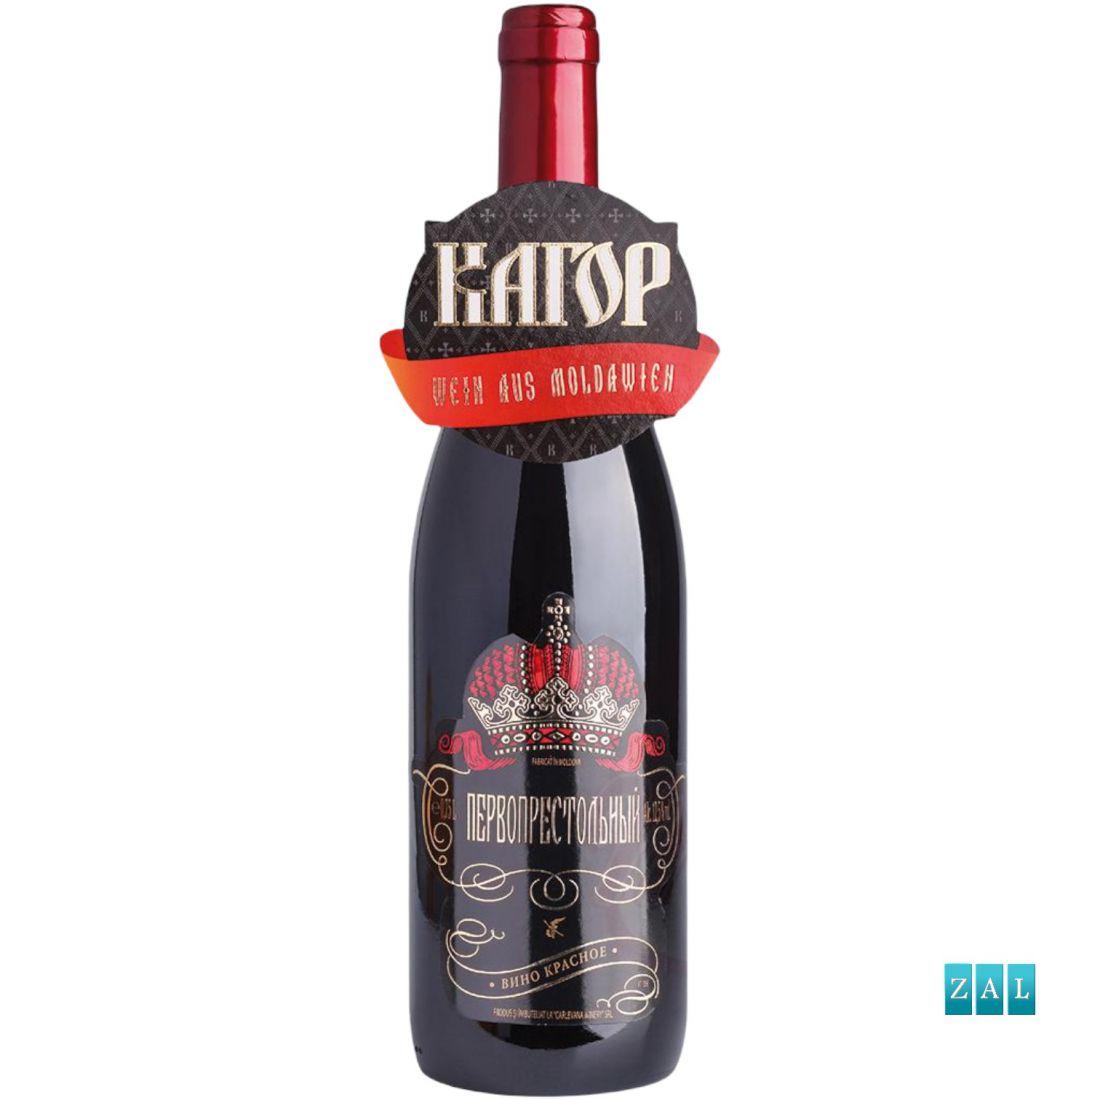 "Kagor ""Pervopresztolnij"" vörösbor"